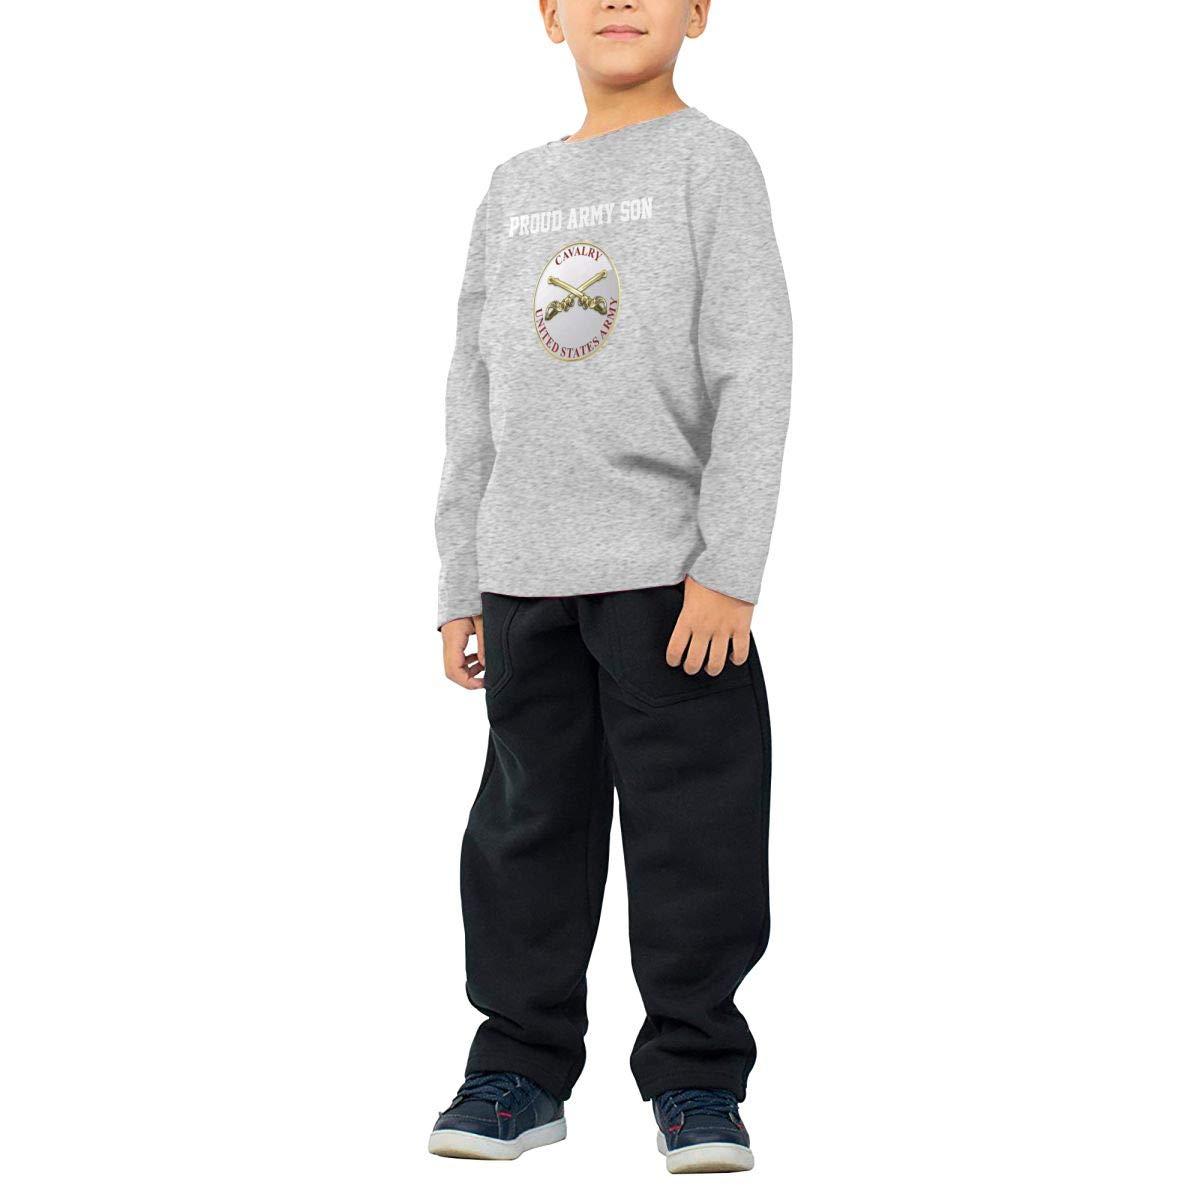 HADYKIDSLOVE US Army Cavalry Kids T-Shirt Long Sleeve Boys Girls T-Shirt